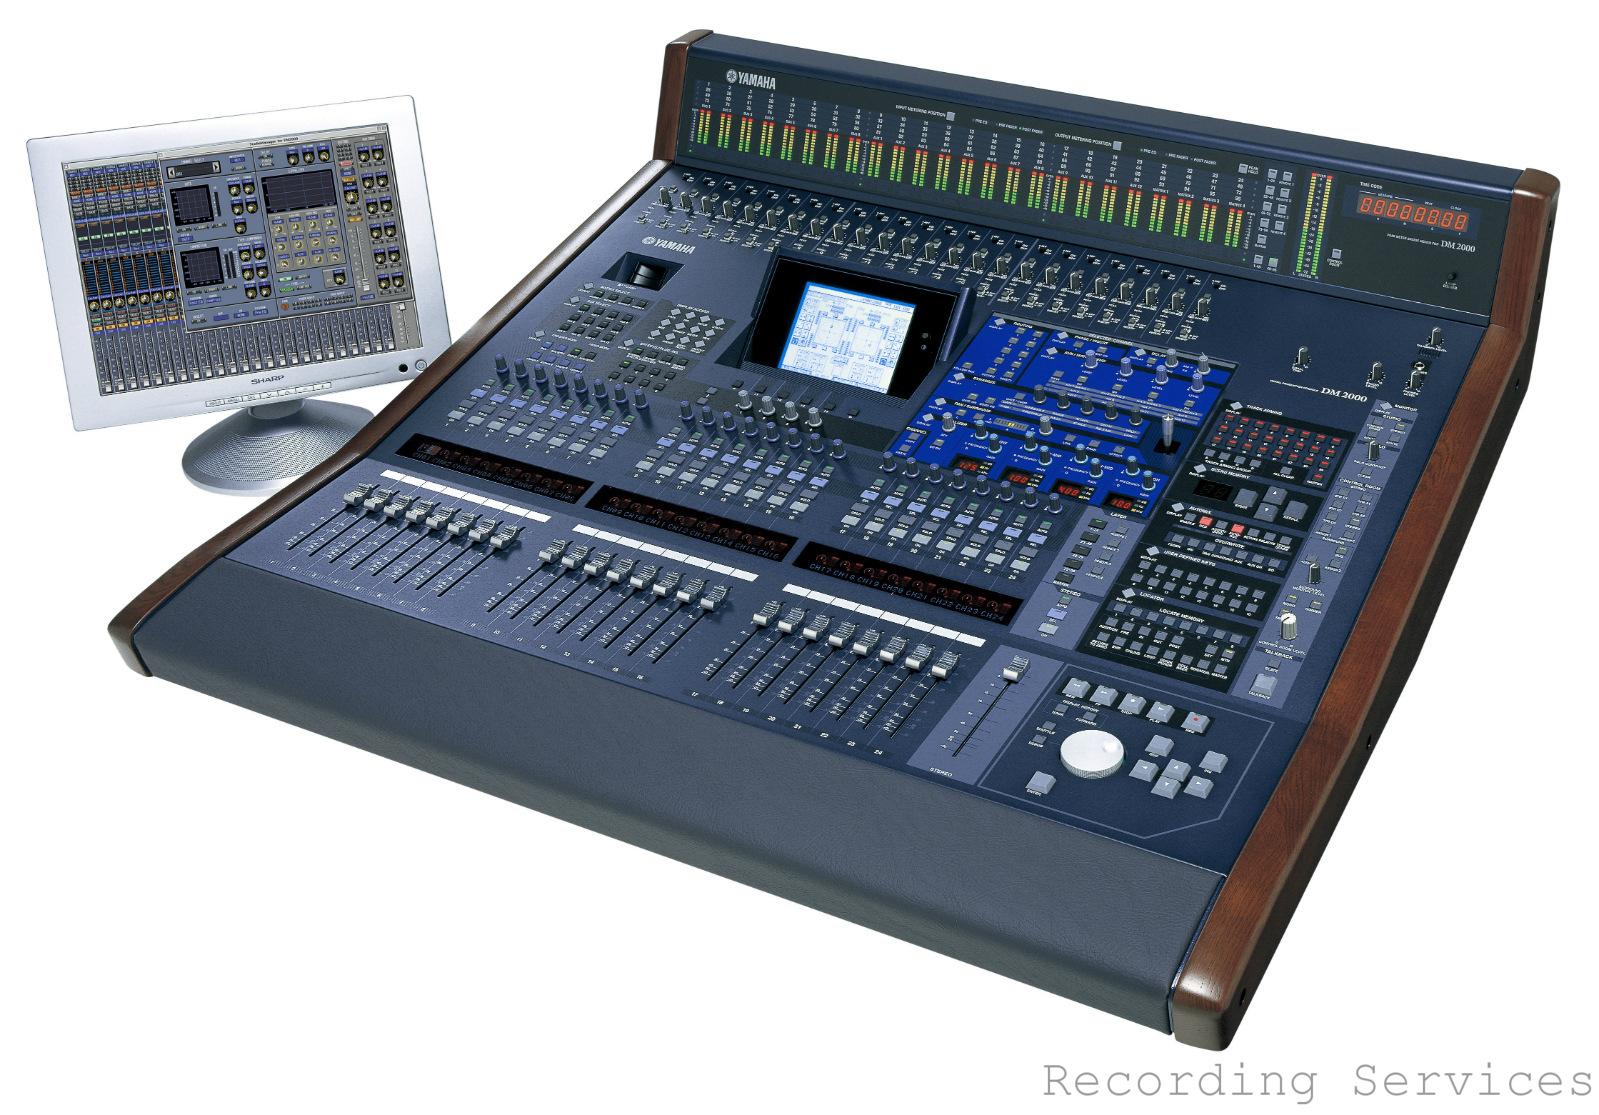 yamaha dm2000 v2 digital mixing console mixer with mb2000 meter bridge case ebay